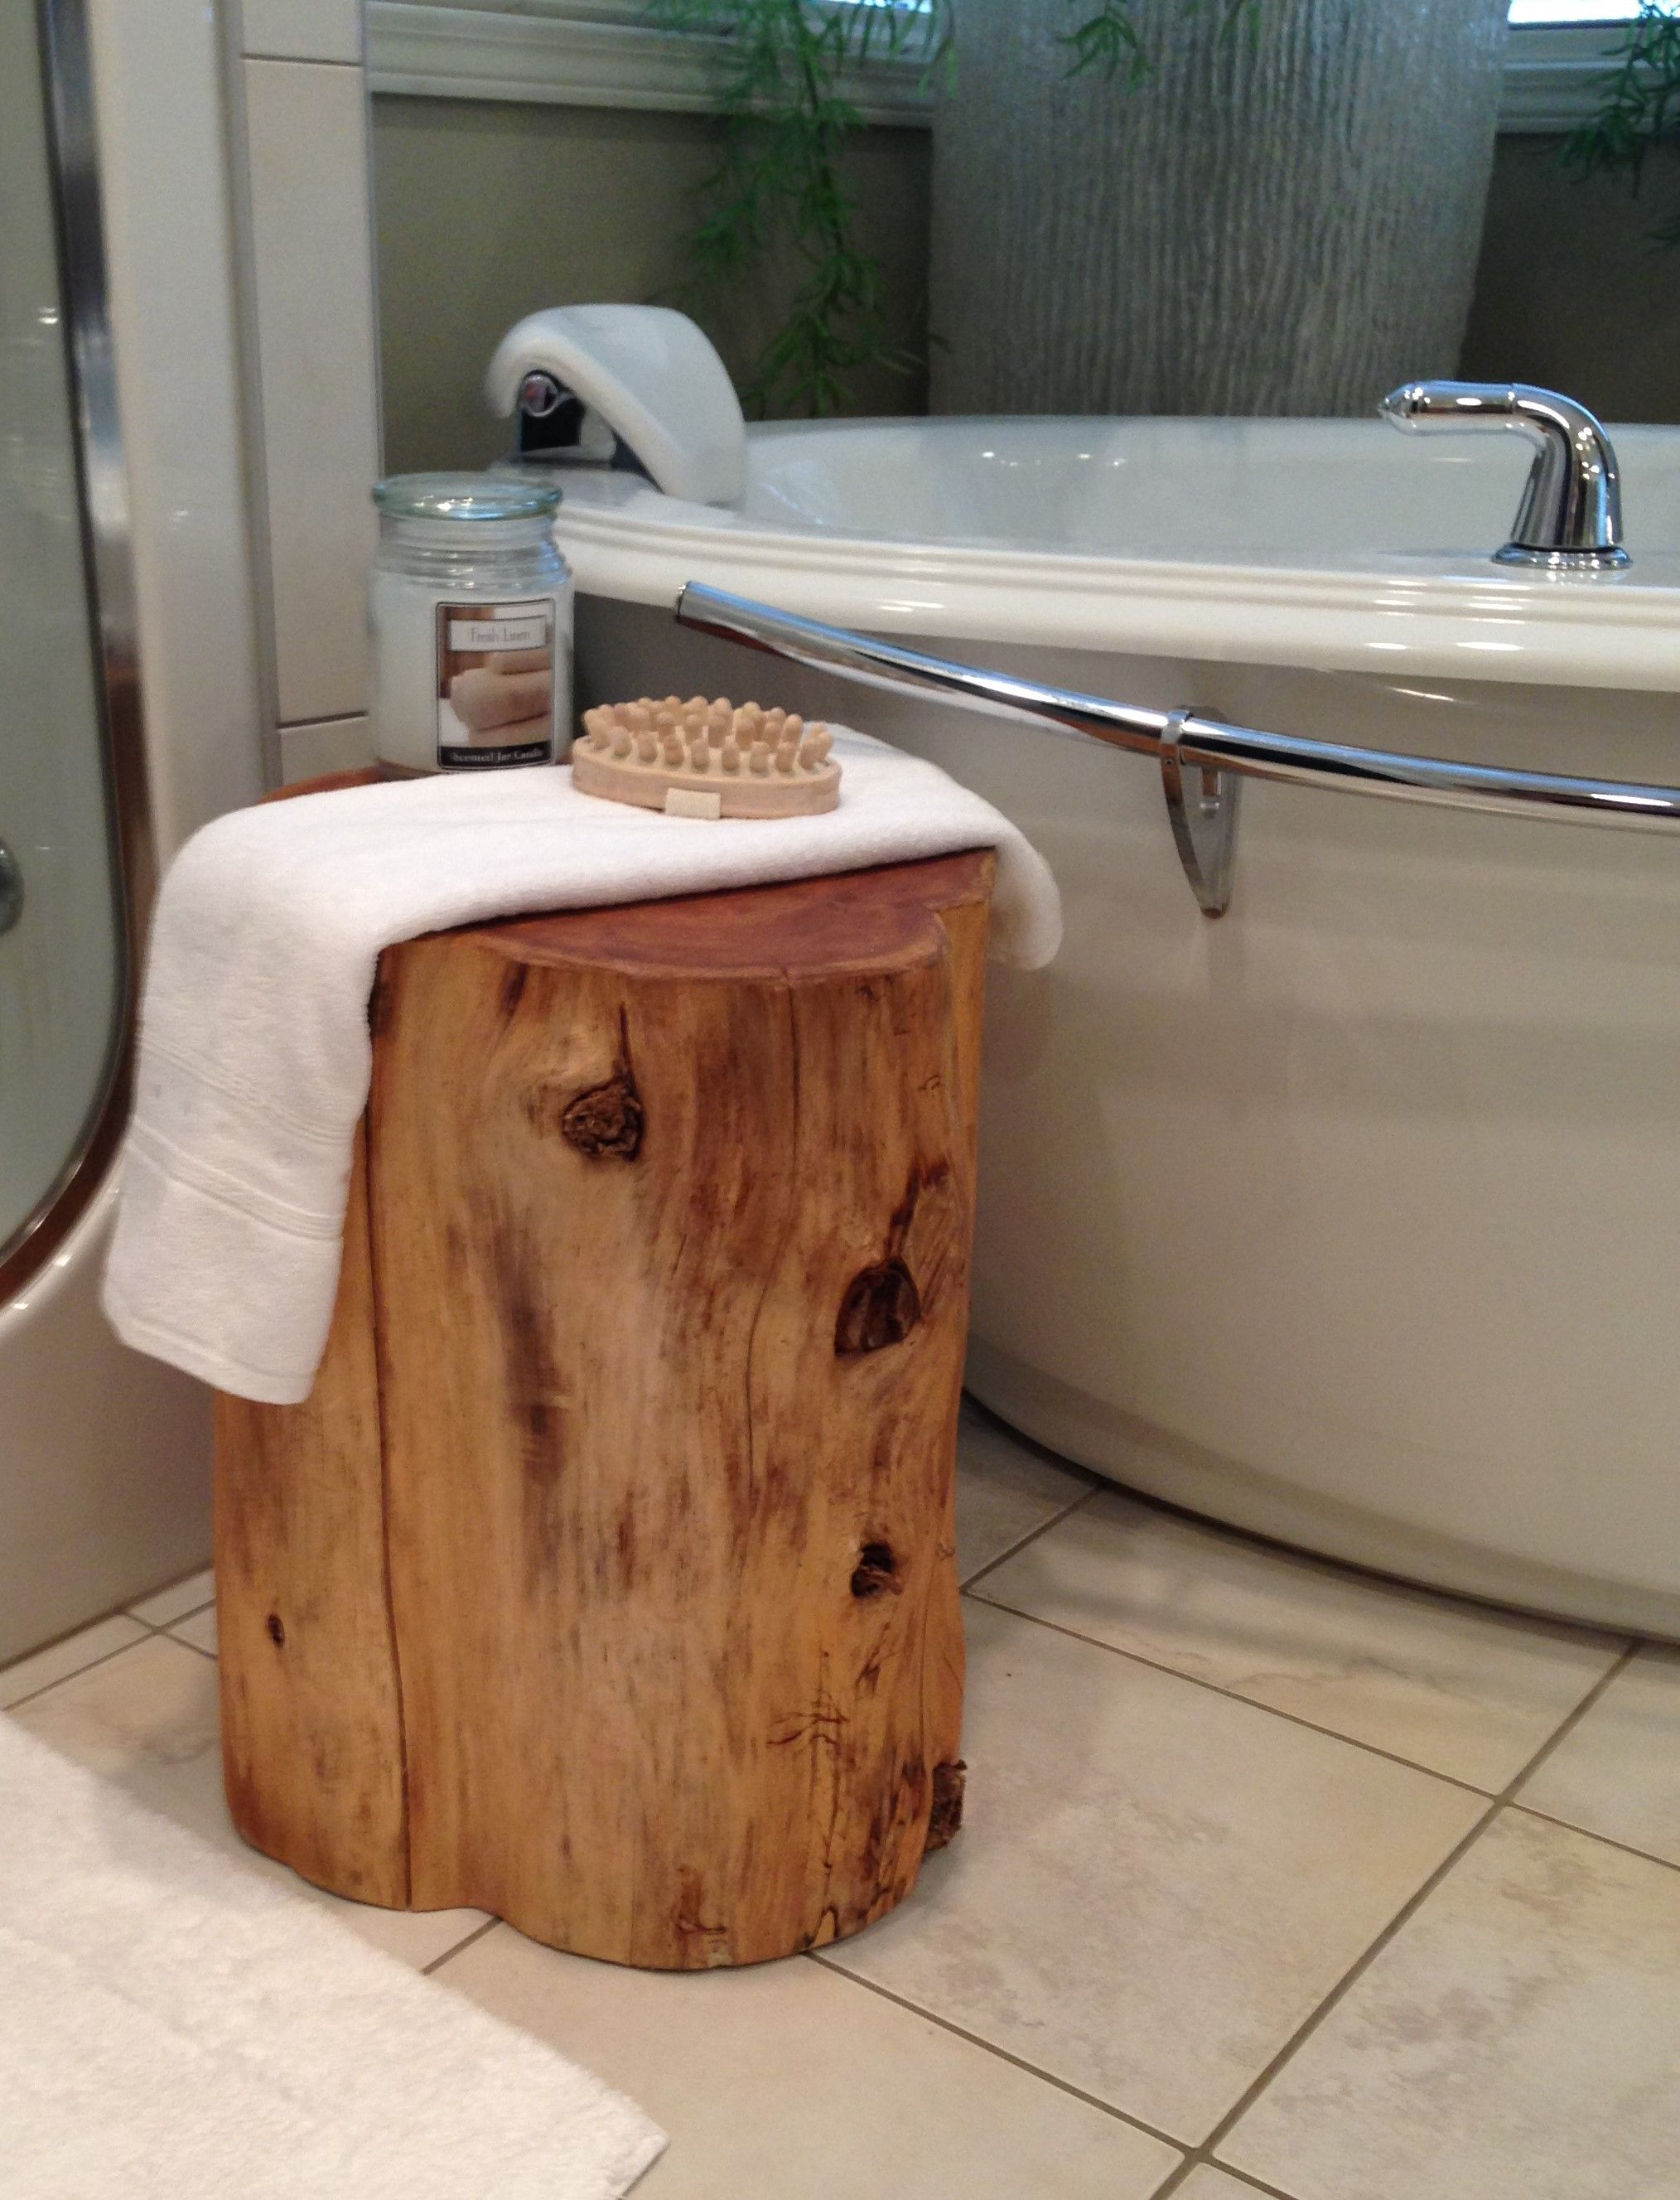 Cedar Stump End Table in bathroom spa (Diy Bathroom Tub)